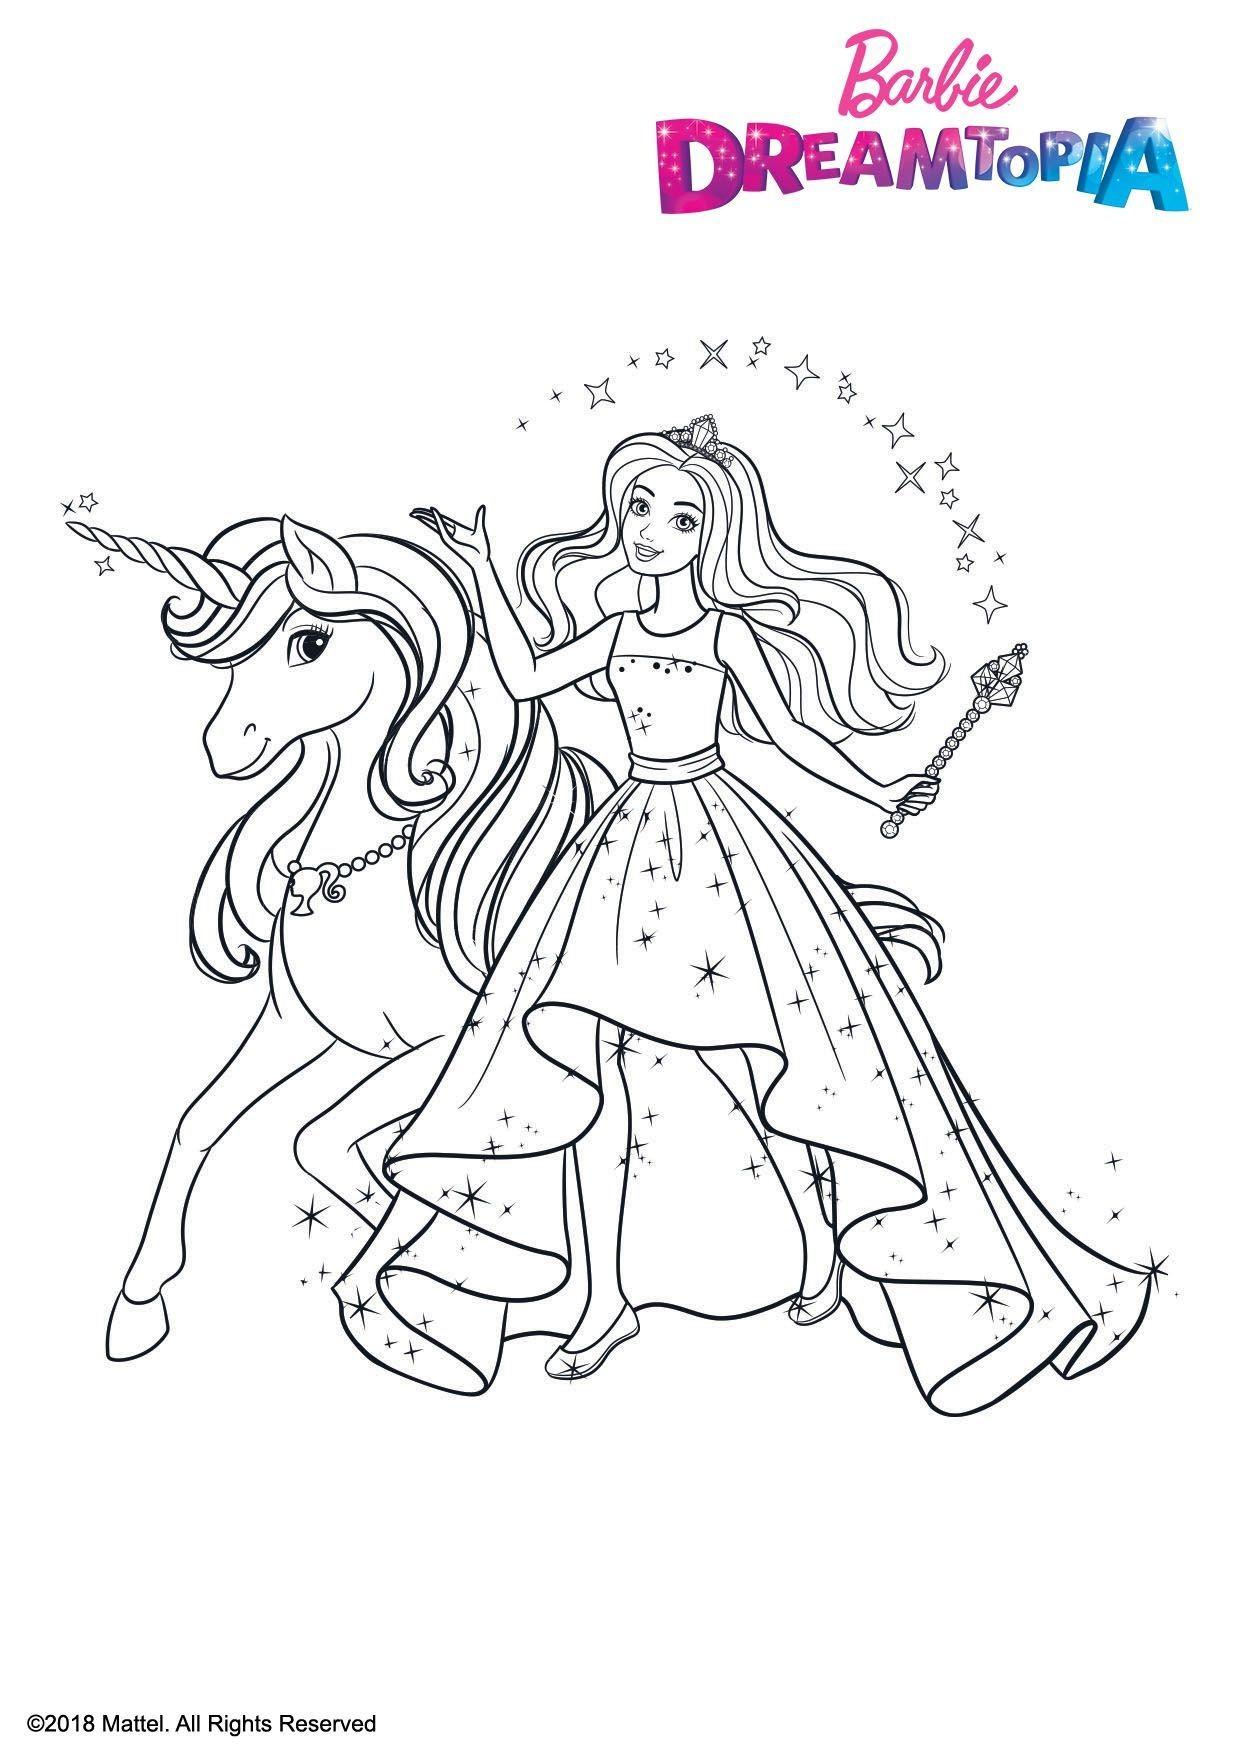 Coloriage Barbie Et La Licorne Ailee Coloriage Barbie Dreamtopia